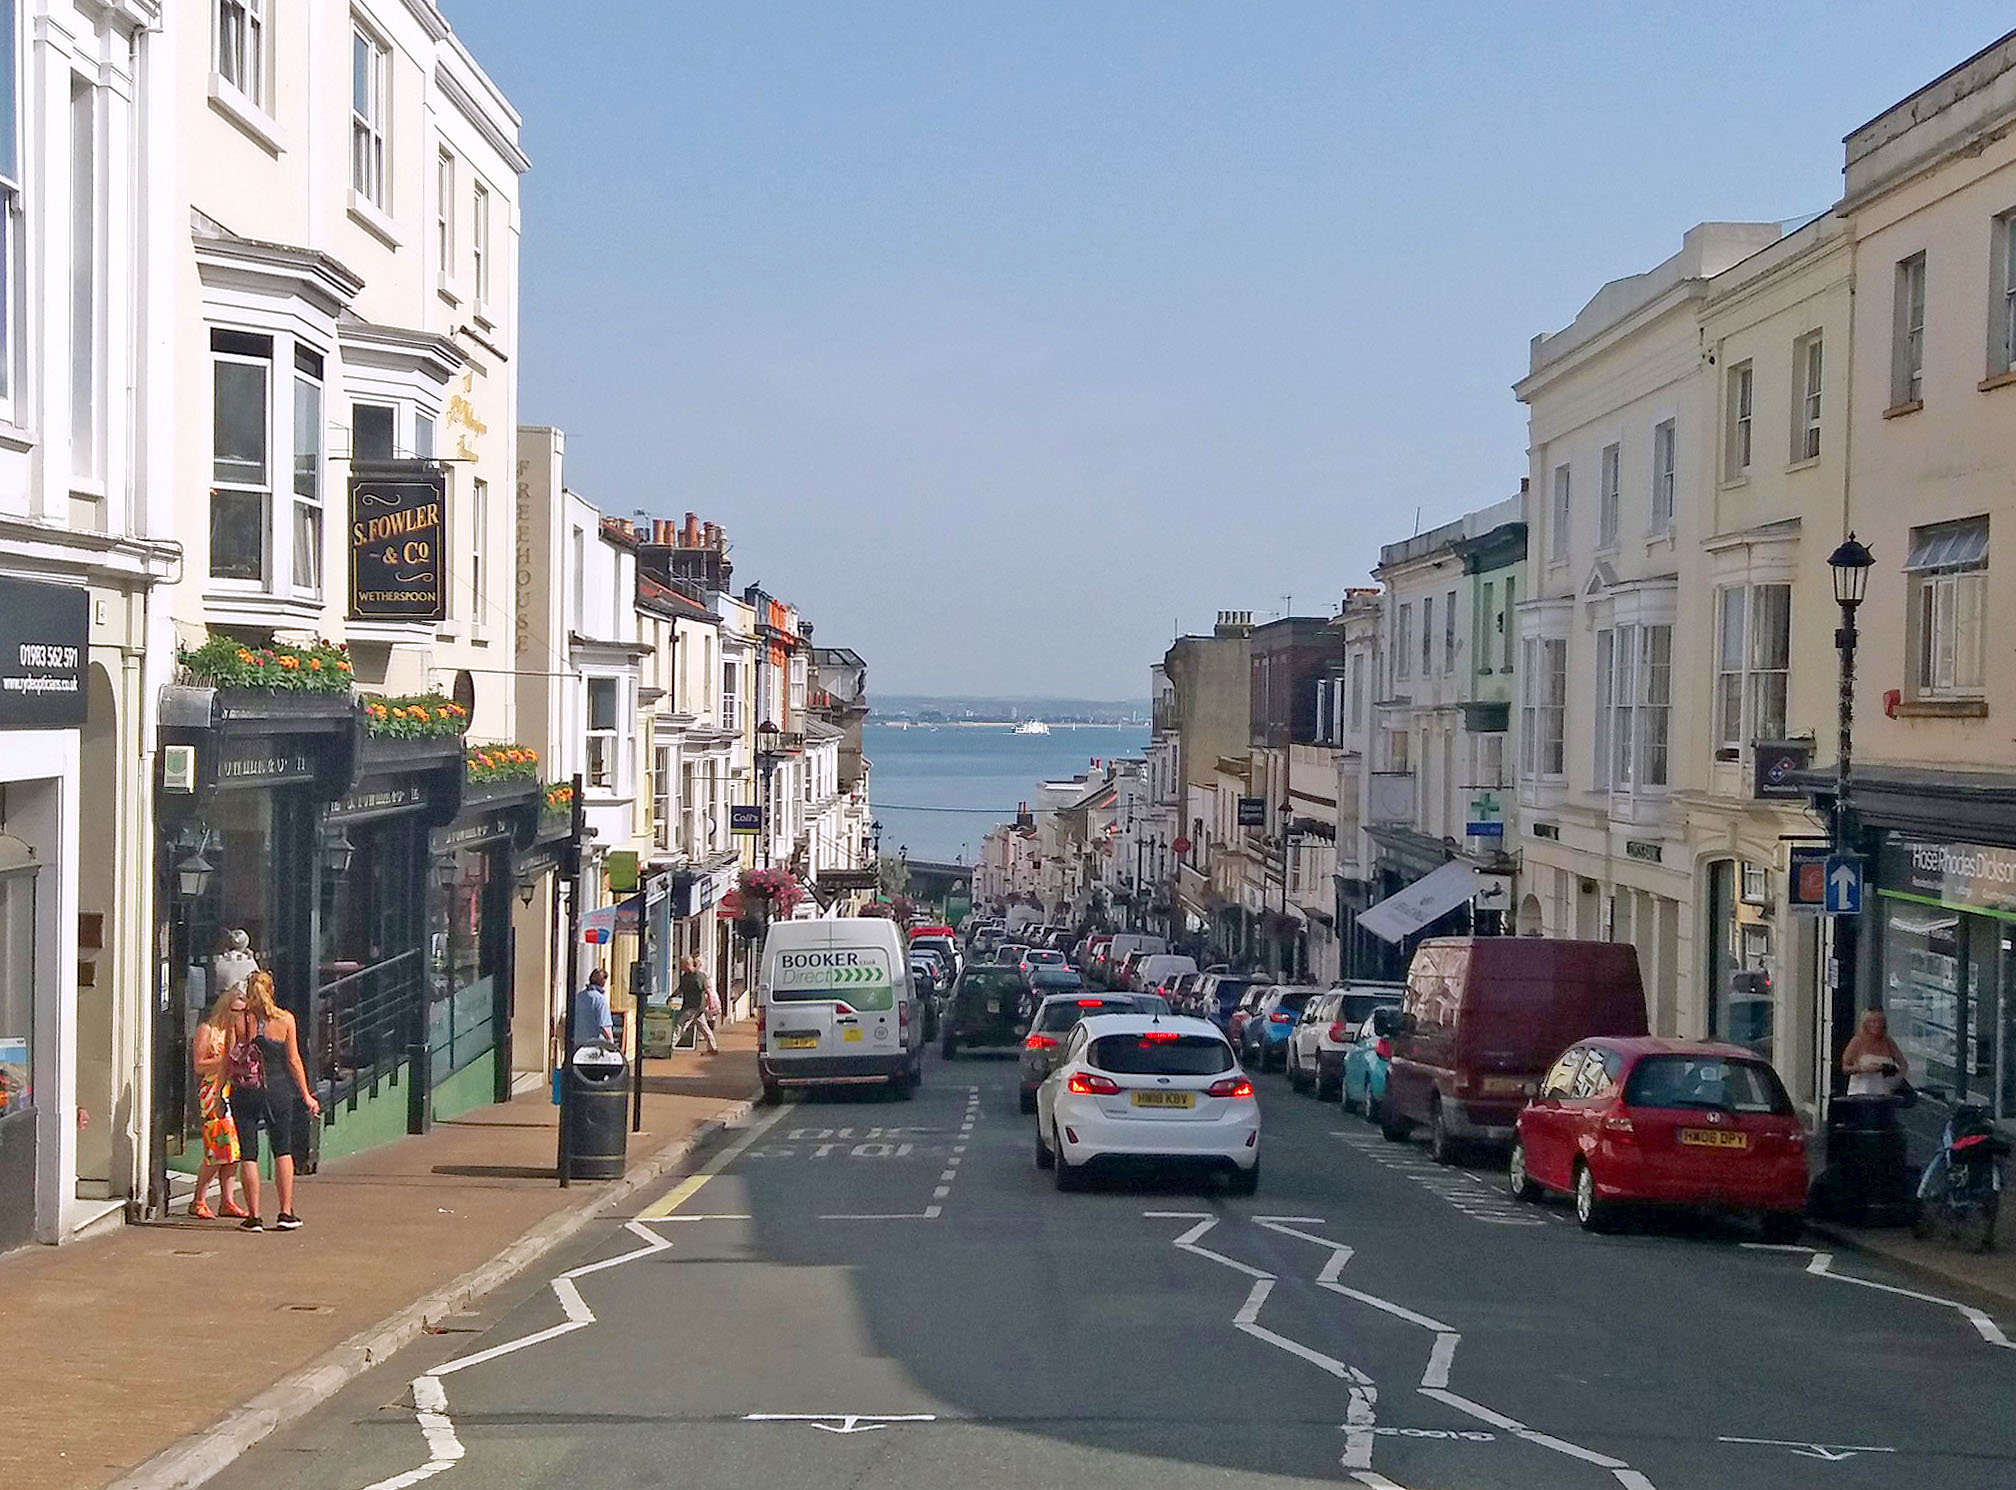 High Street, Ryde, Isle of Wight by Ilona Karse.jpg